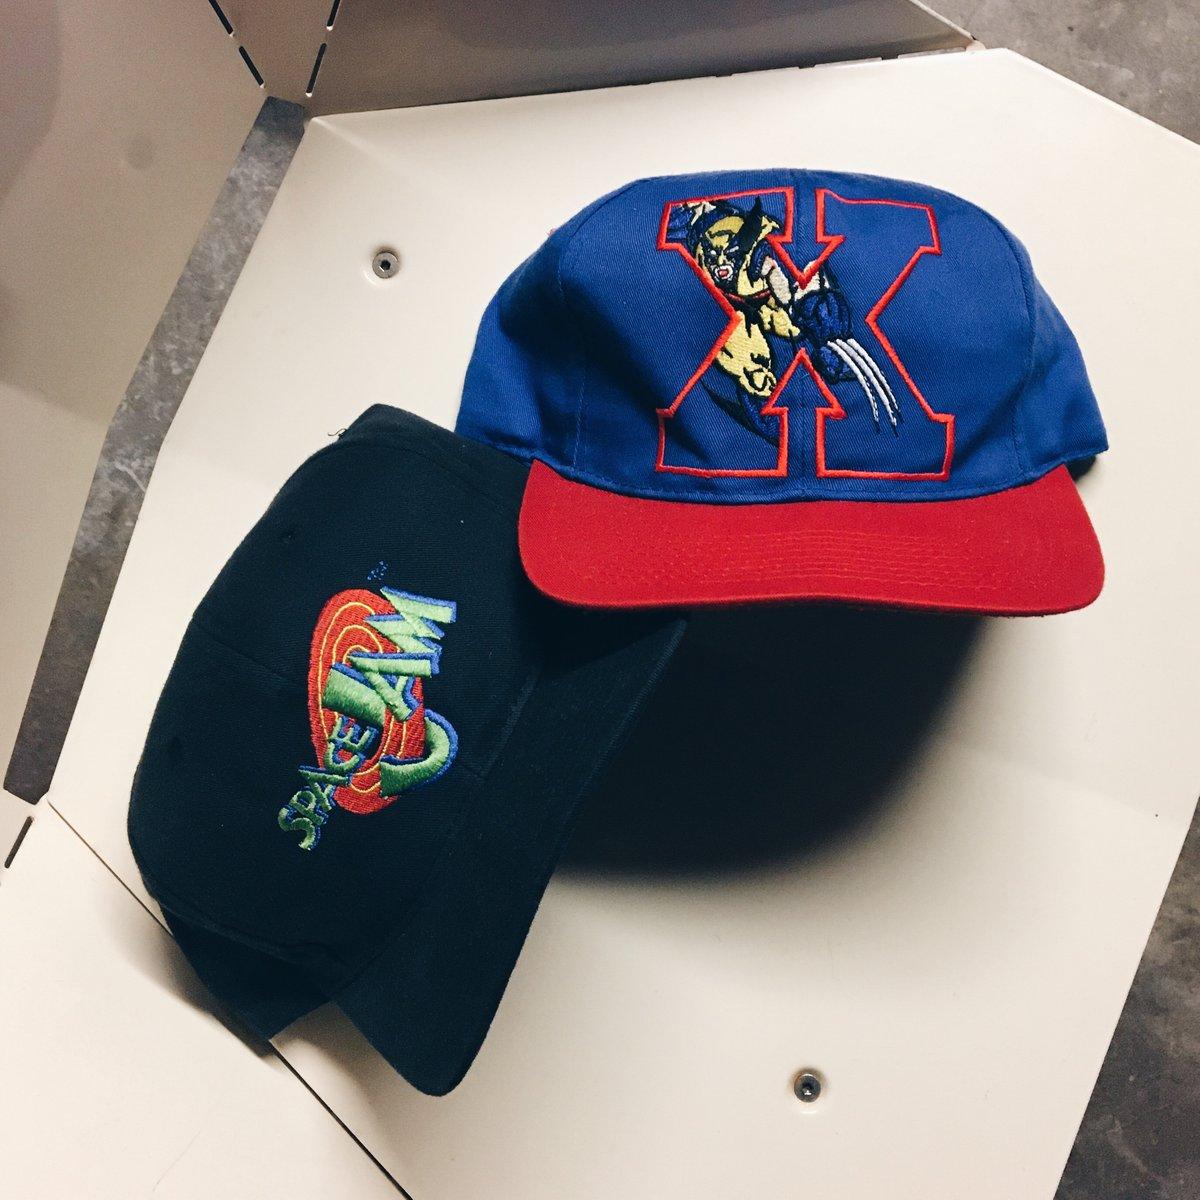 Image of Original 90's Snapback Hats.